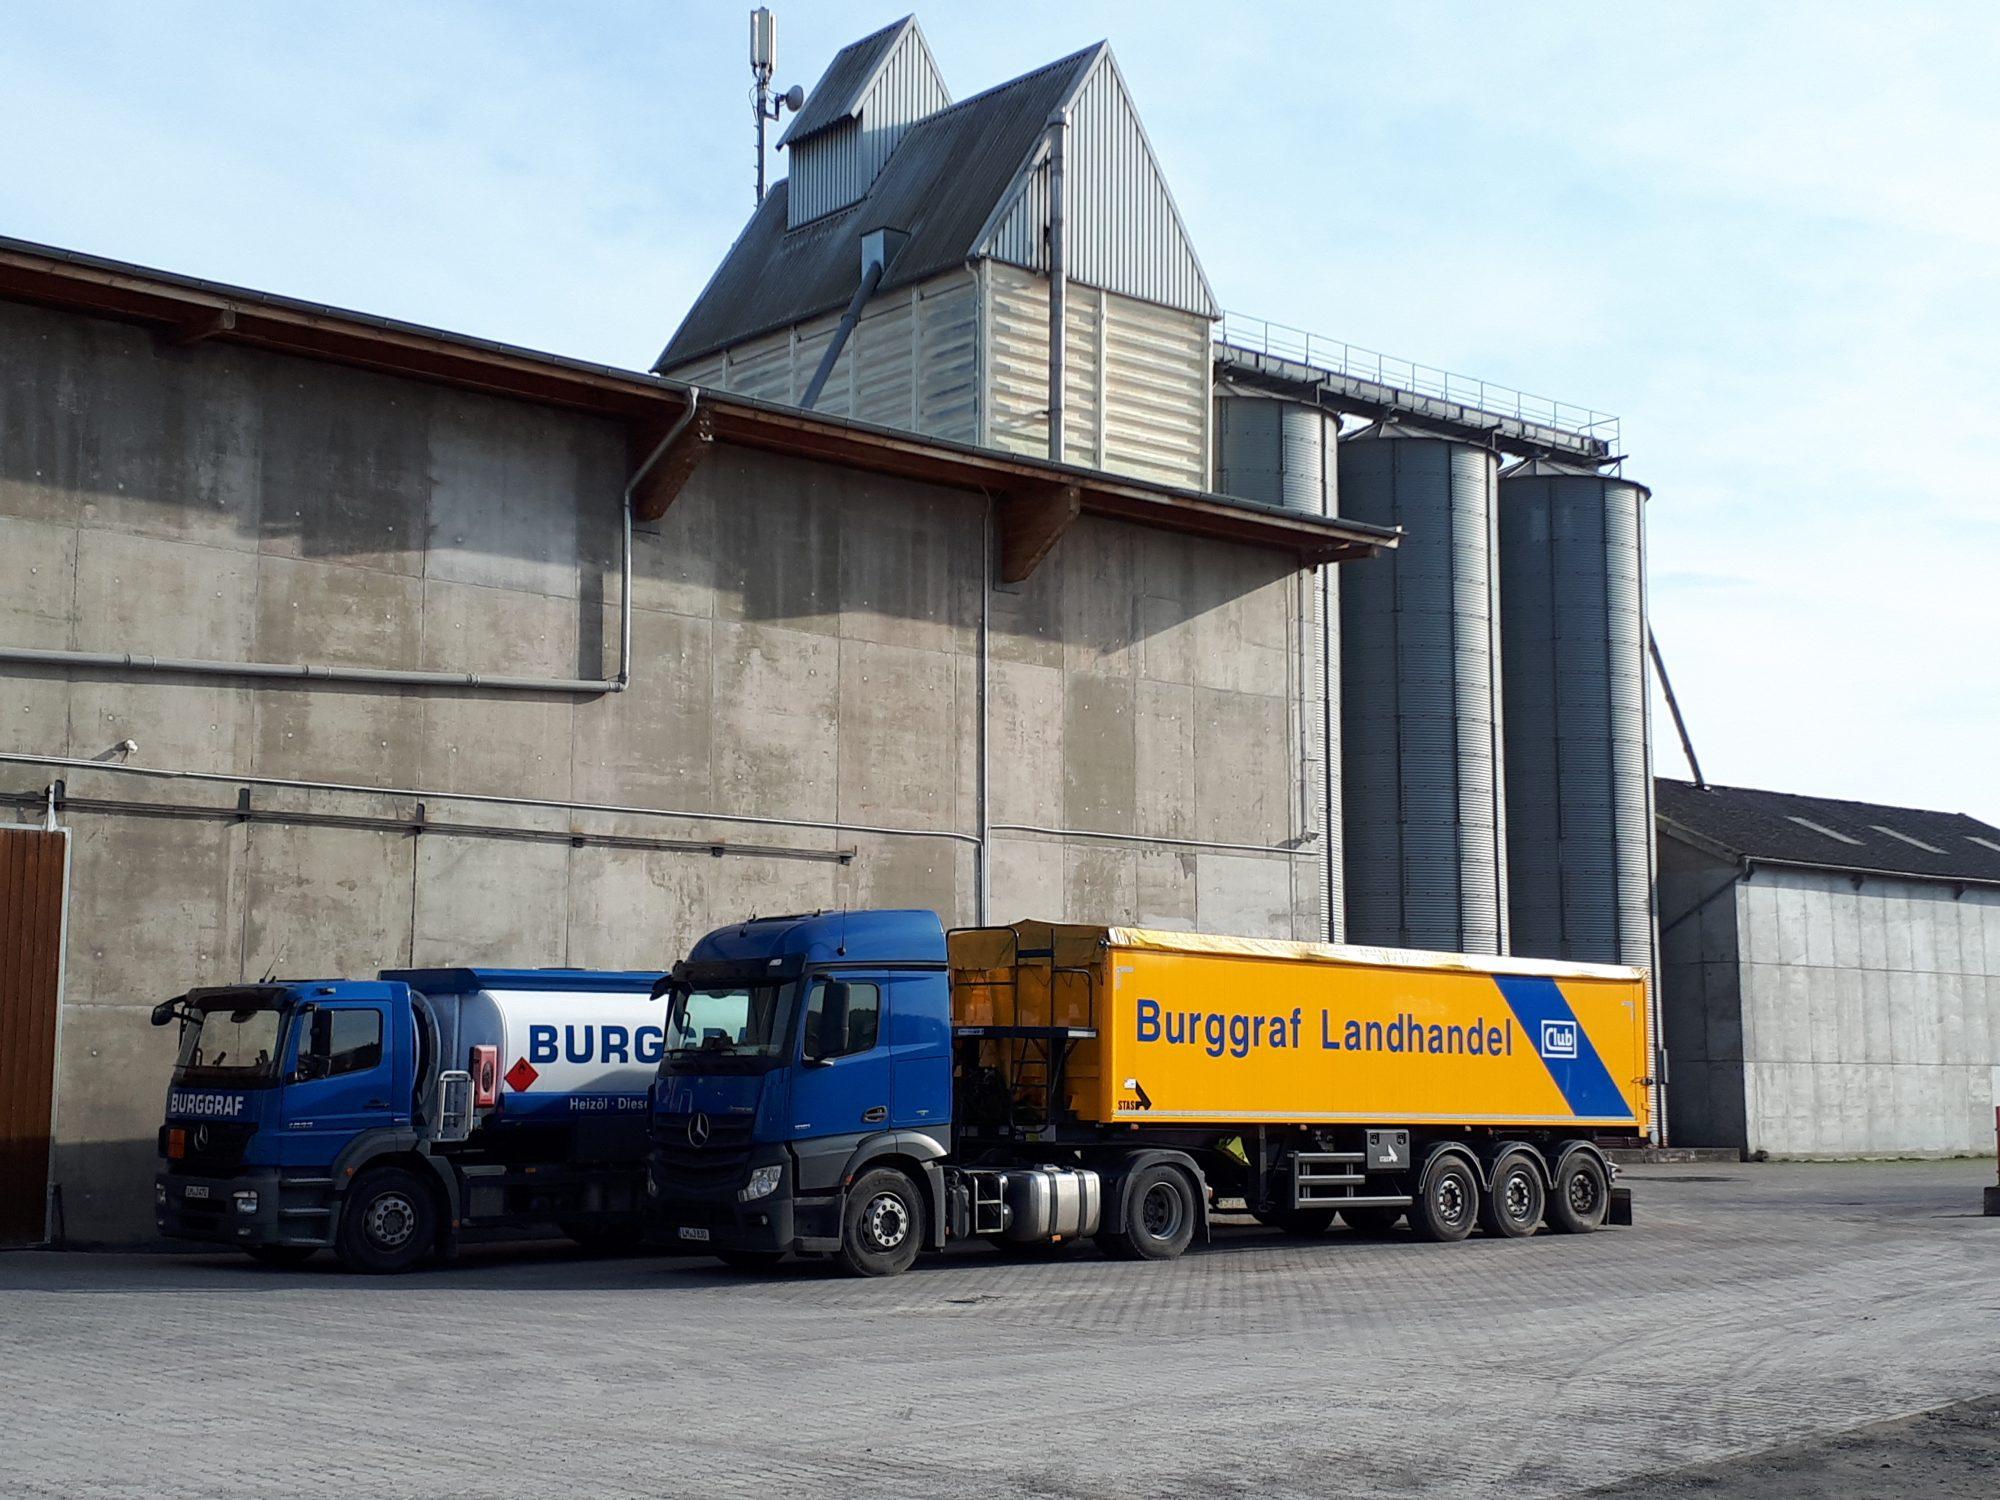 Burggraf Landhandel GmbH